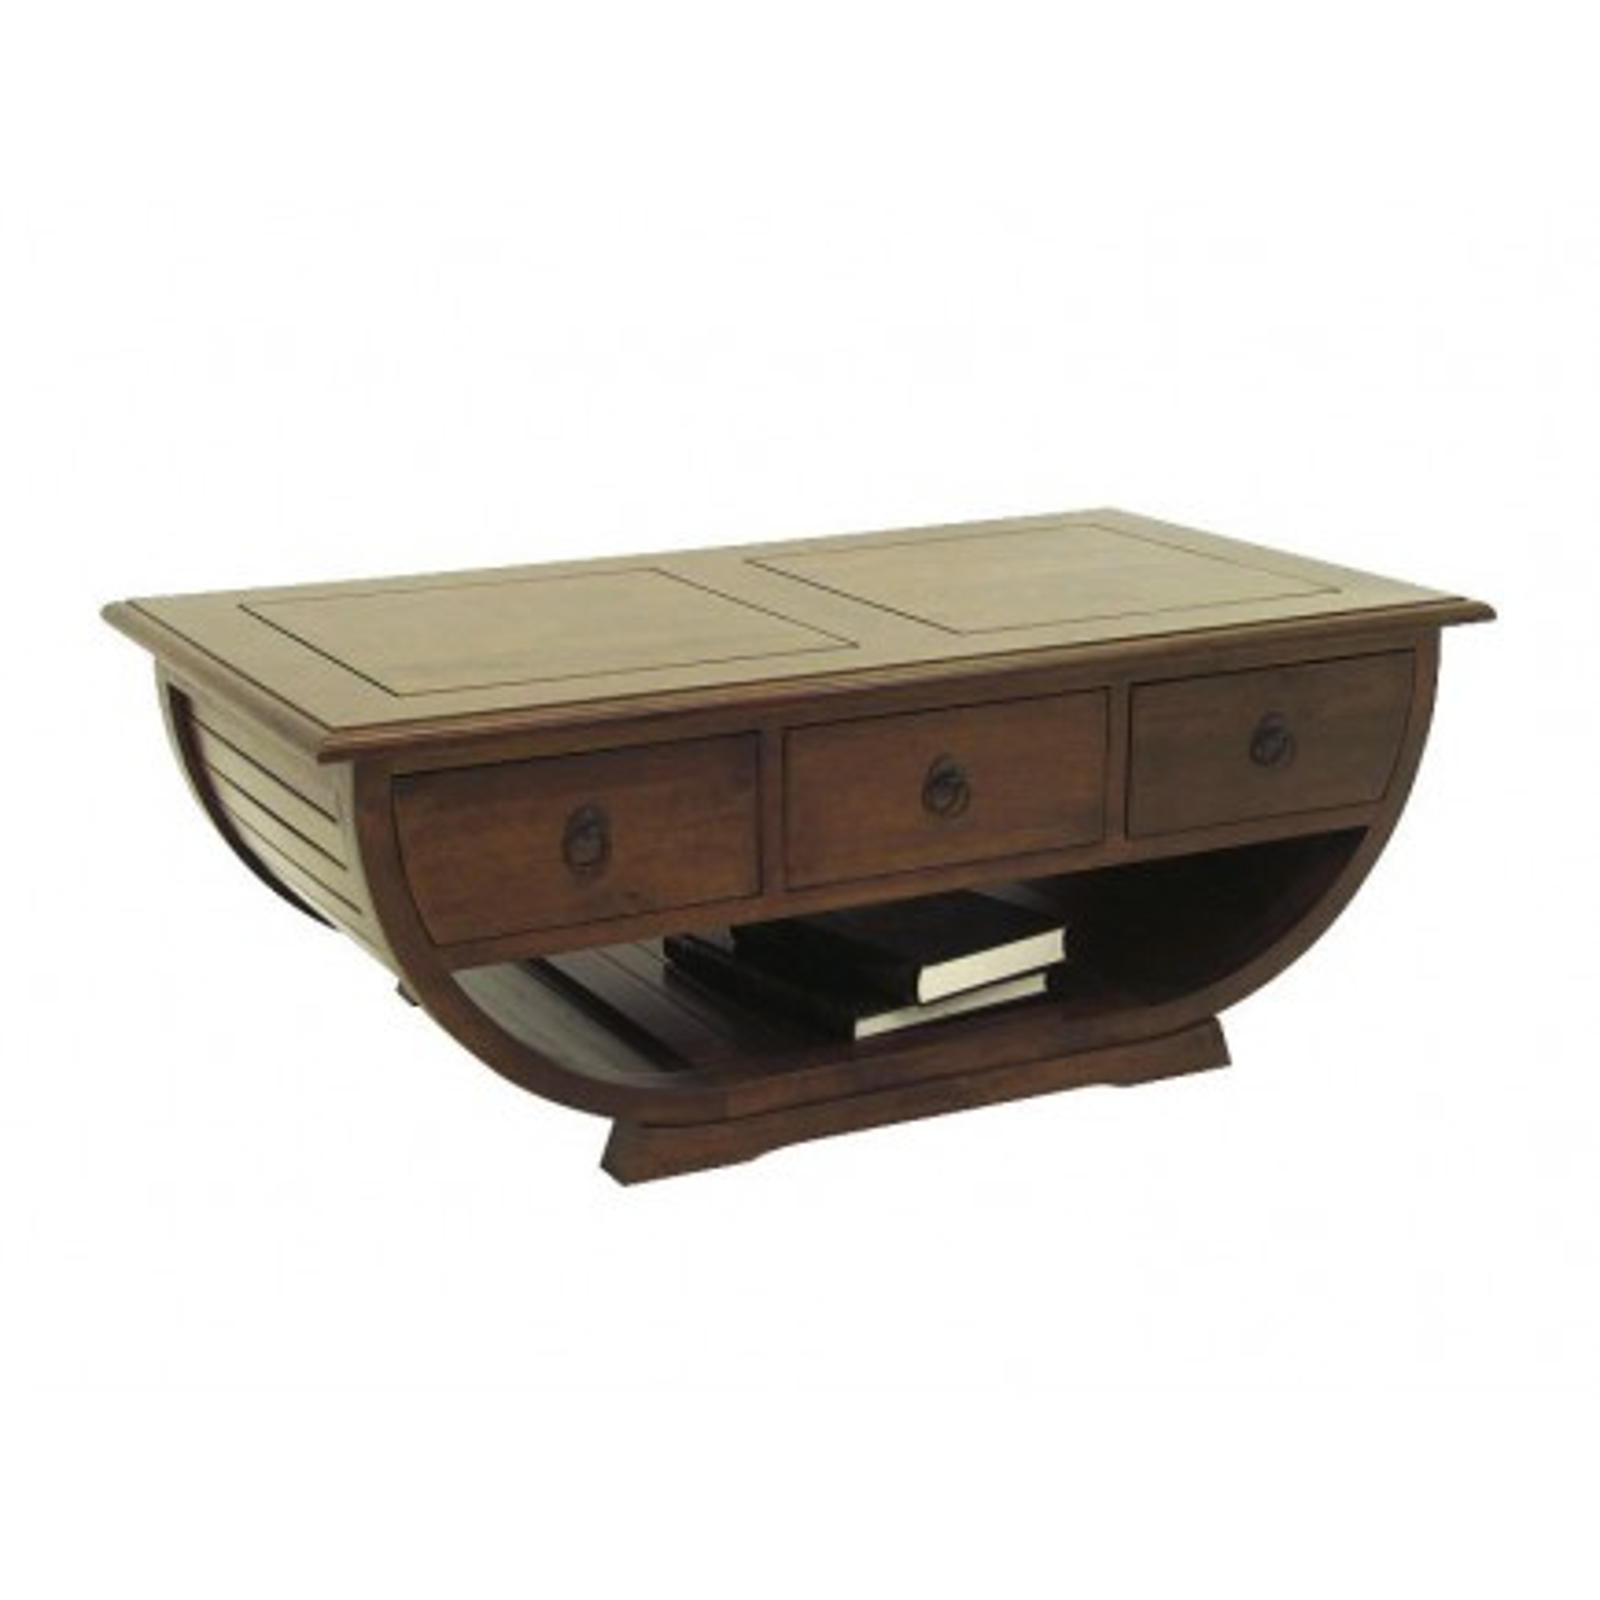 Table Basse Panama Hévéa - meuble bois massif